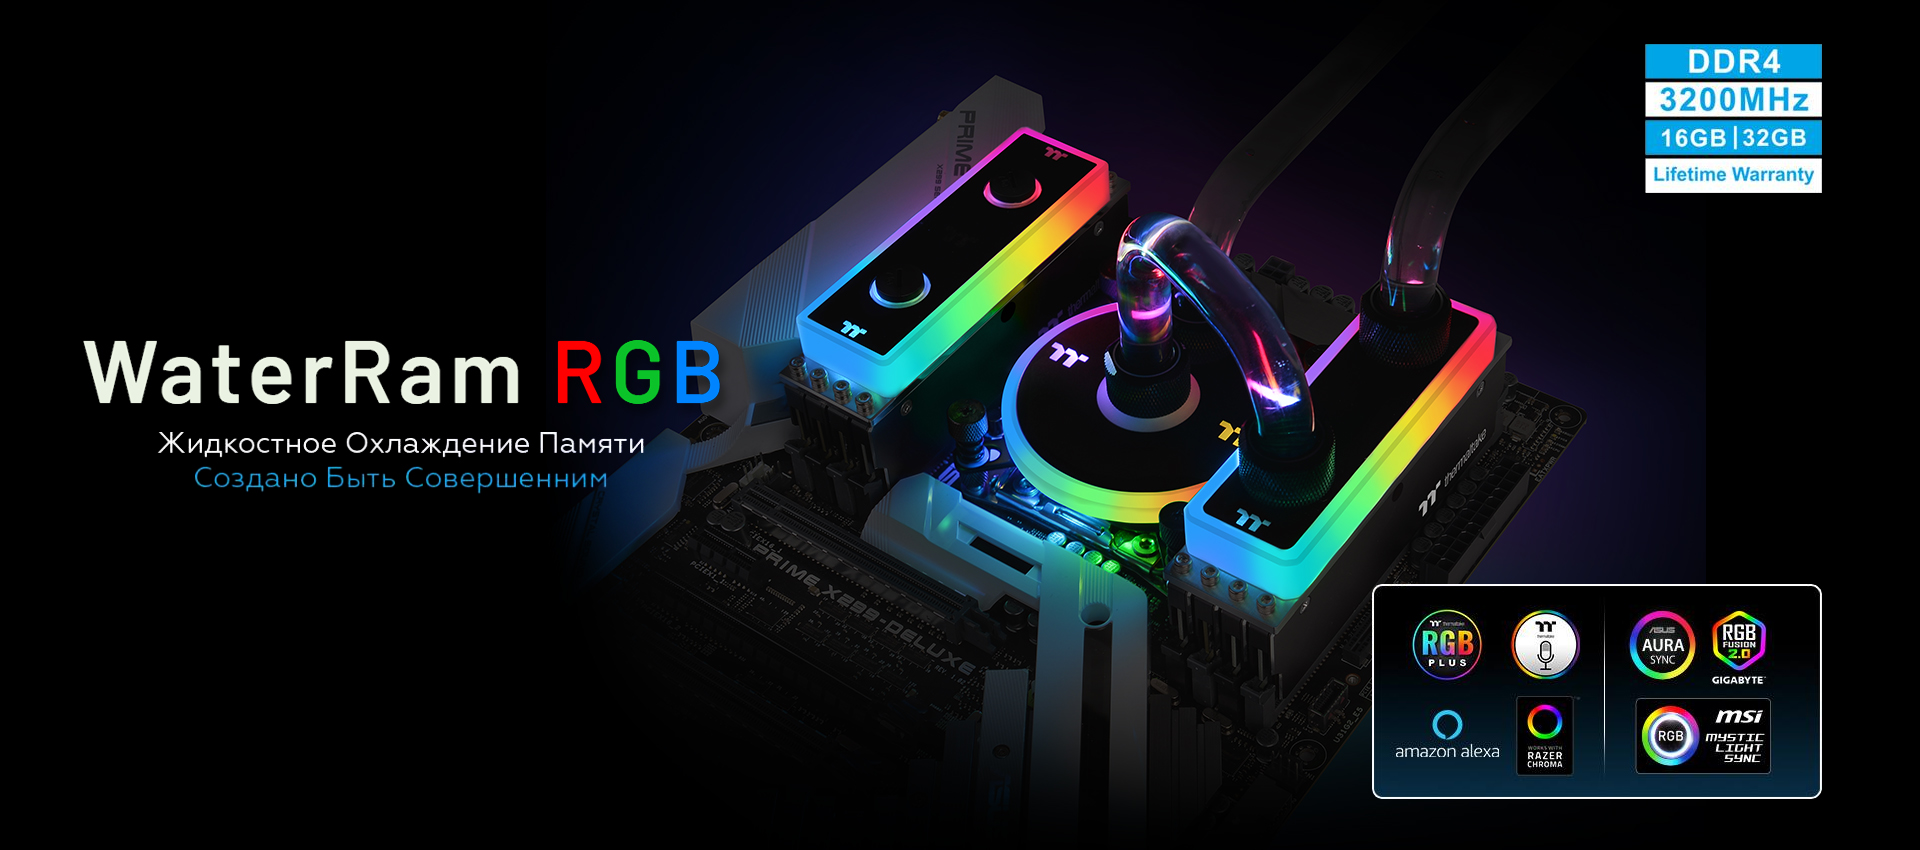 WaterRam RGB Liquid Cooling Memory DDR4 3200MHz 32GB (8GB x 4)